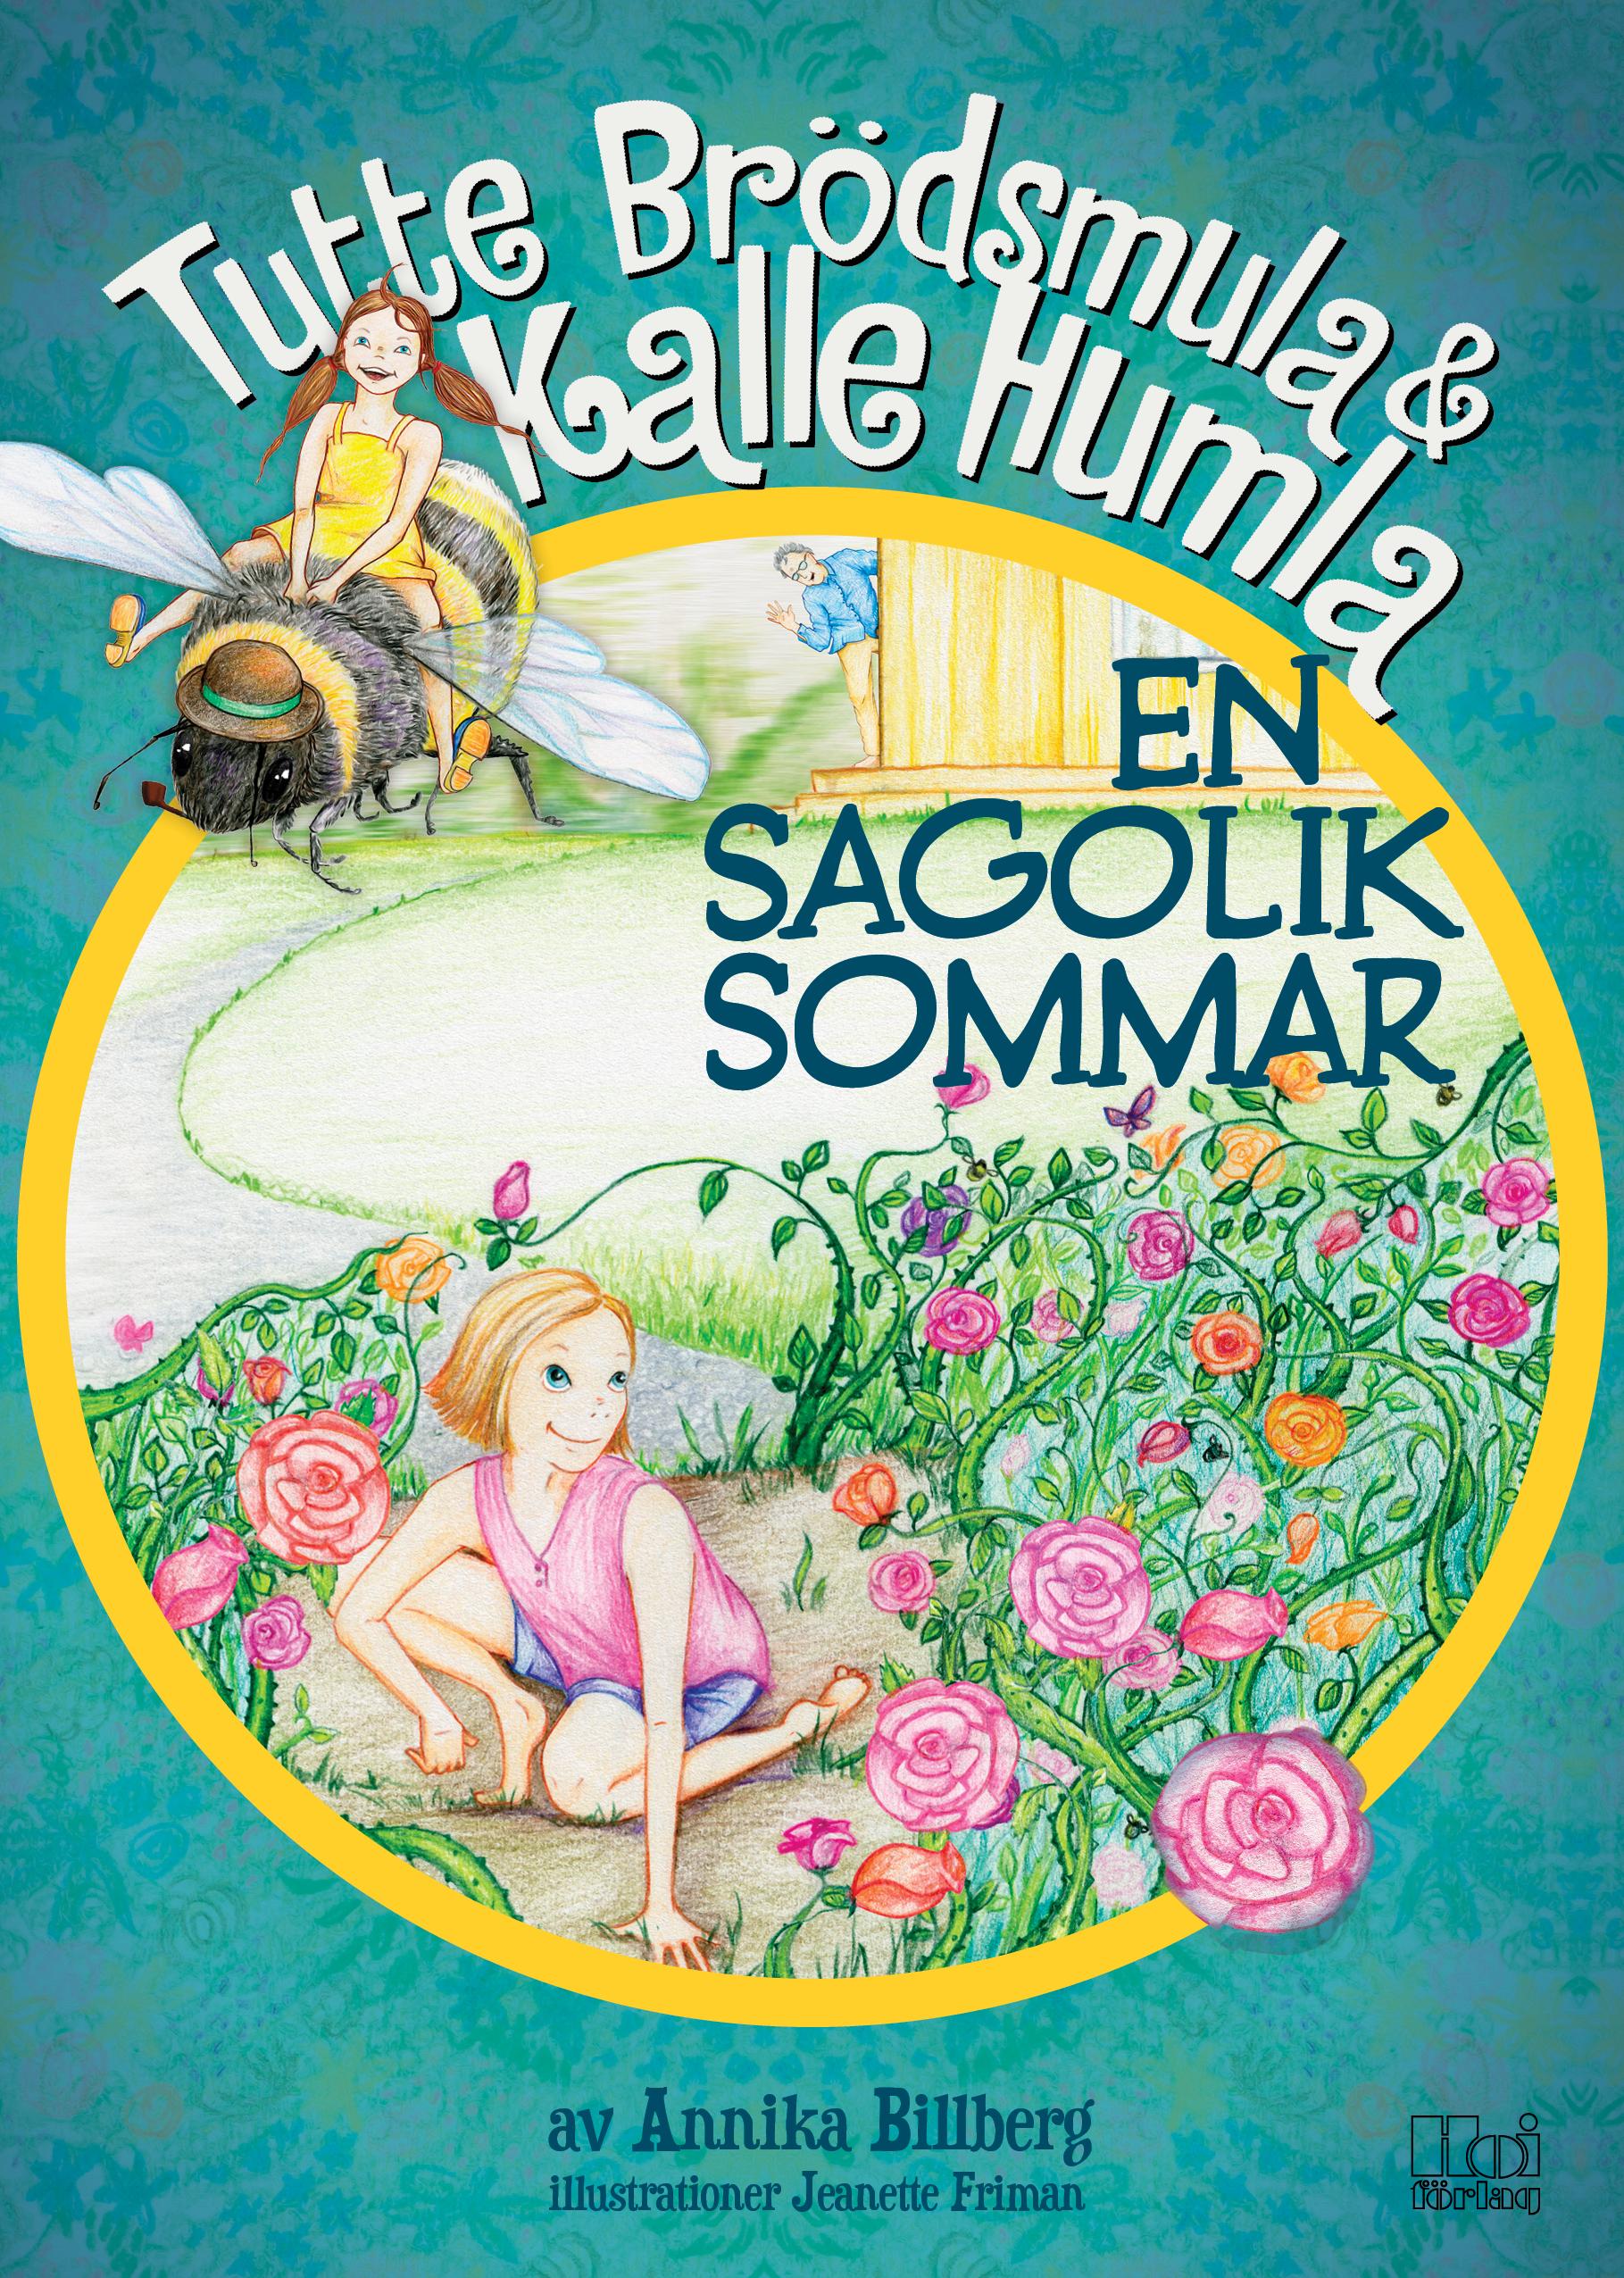 Tutte och Kalle_En sagolik sommar_WEBB.jpg